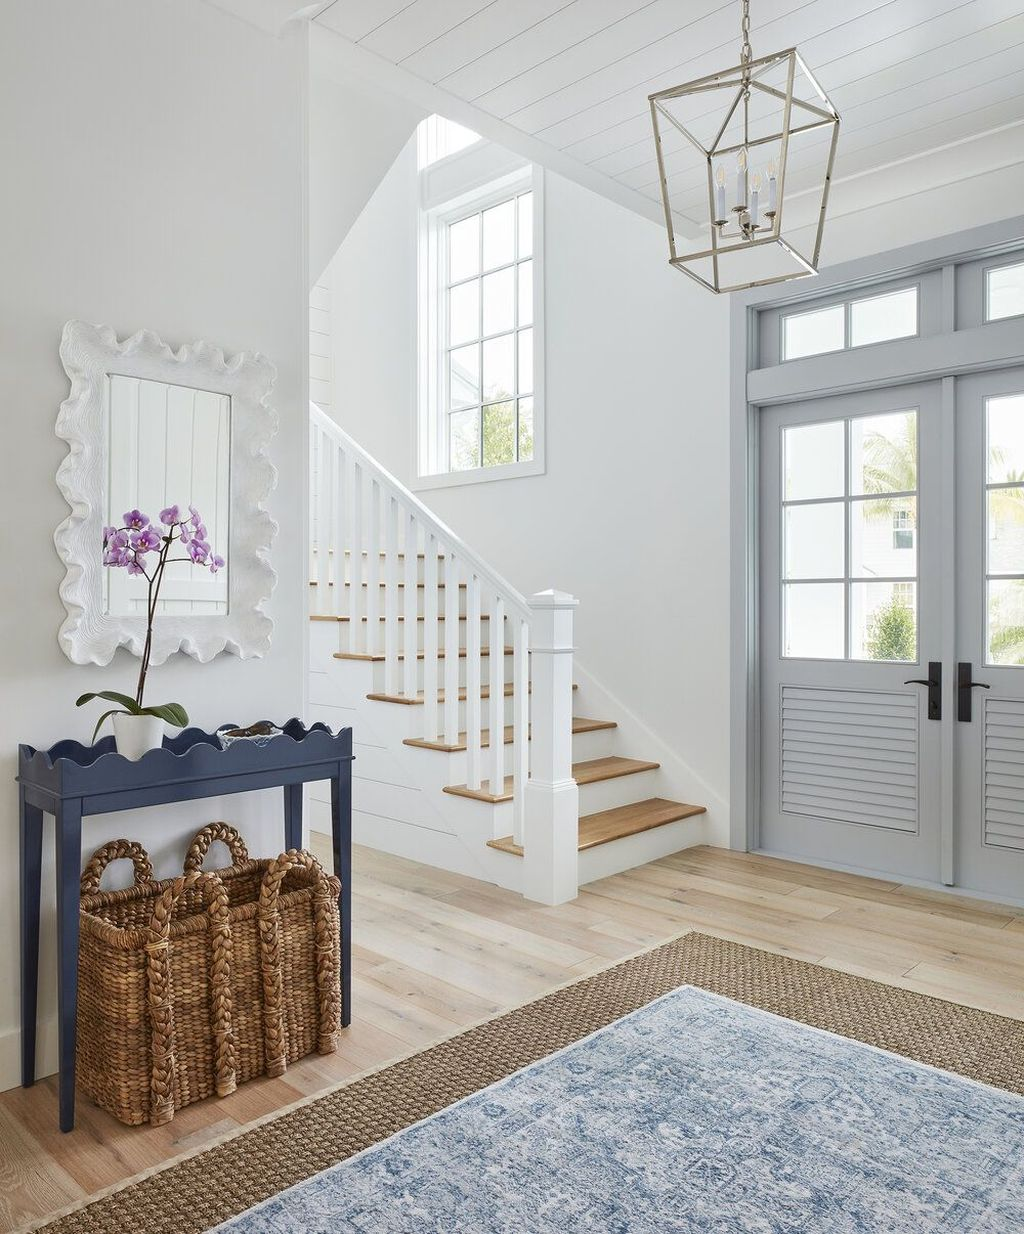 Admirable Beach House Decor Ideas You Should Copy 12